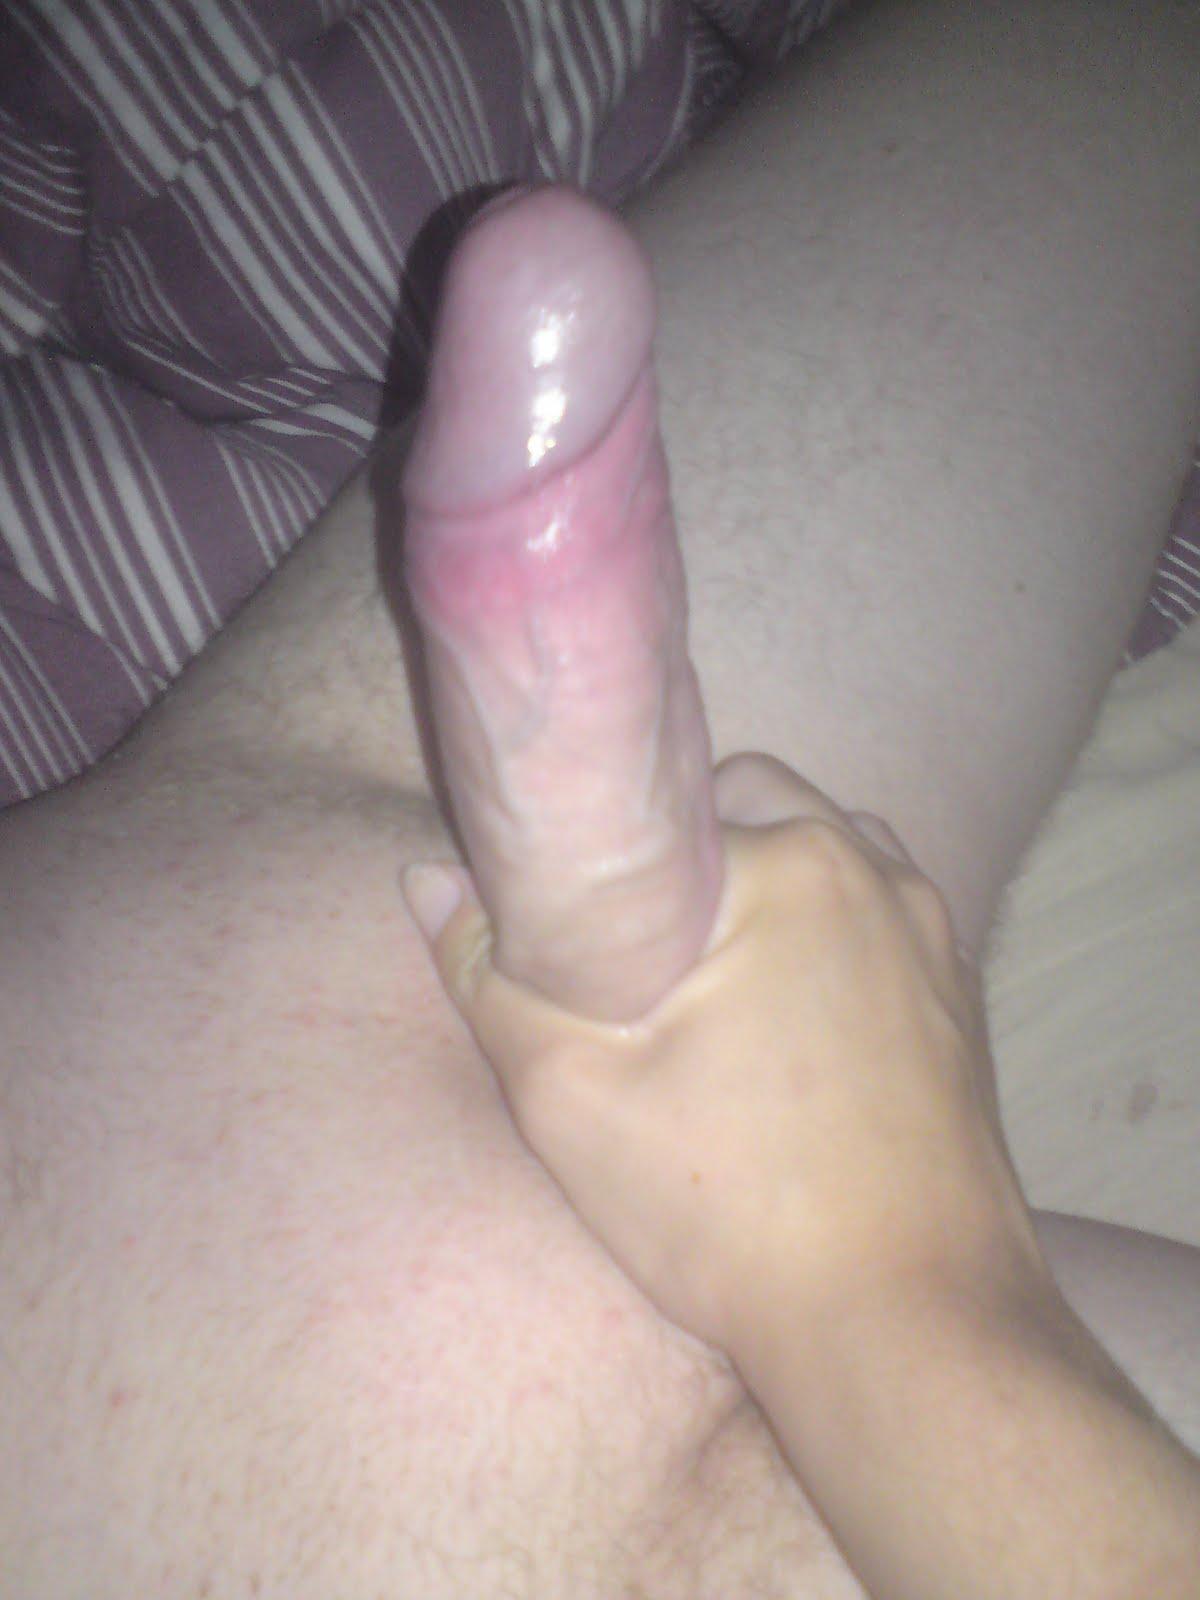 köpa glidmedel black anal